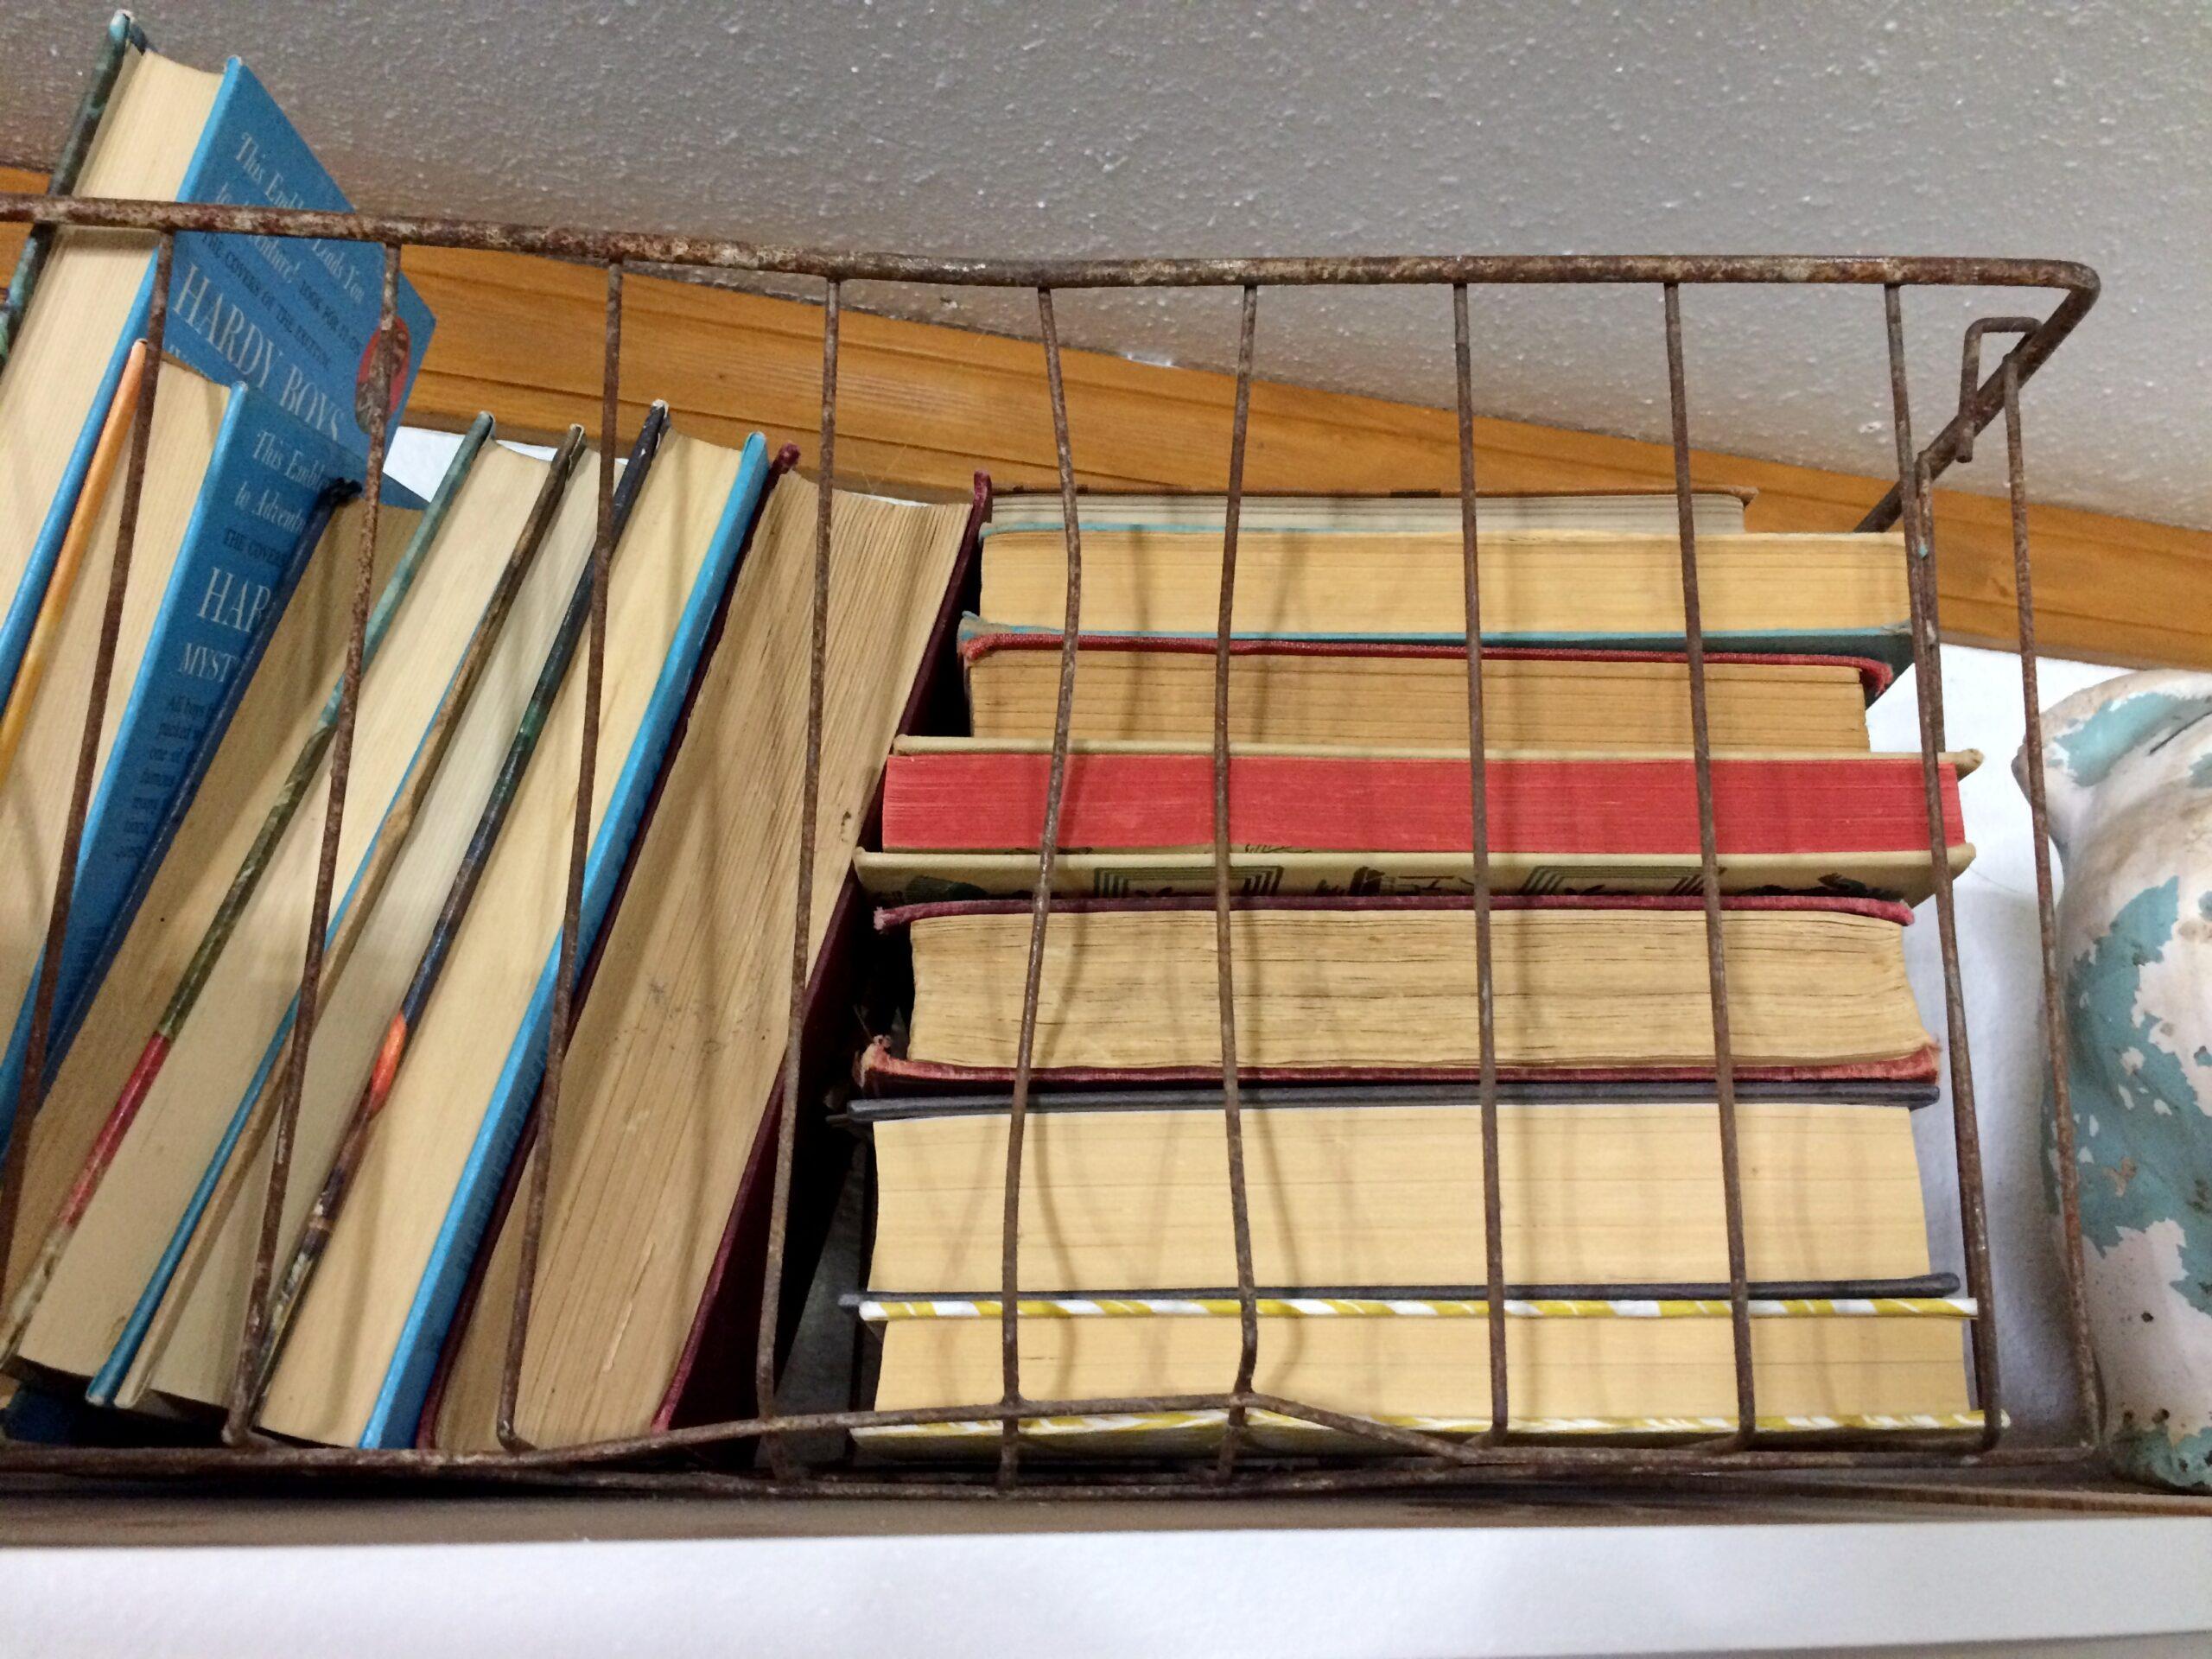 How to Paint Laminate Bookshelves